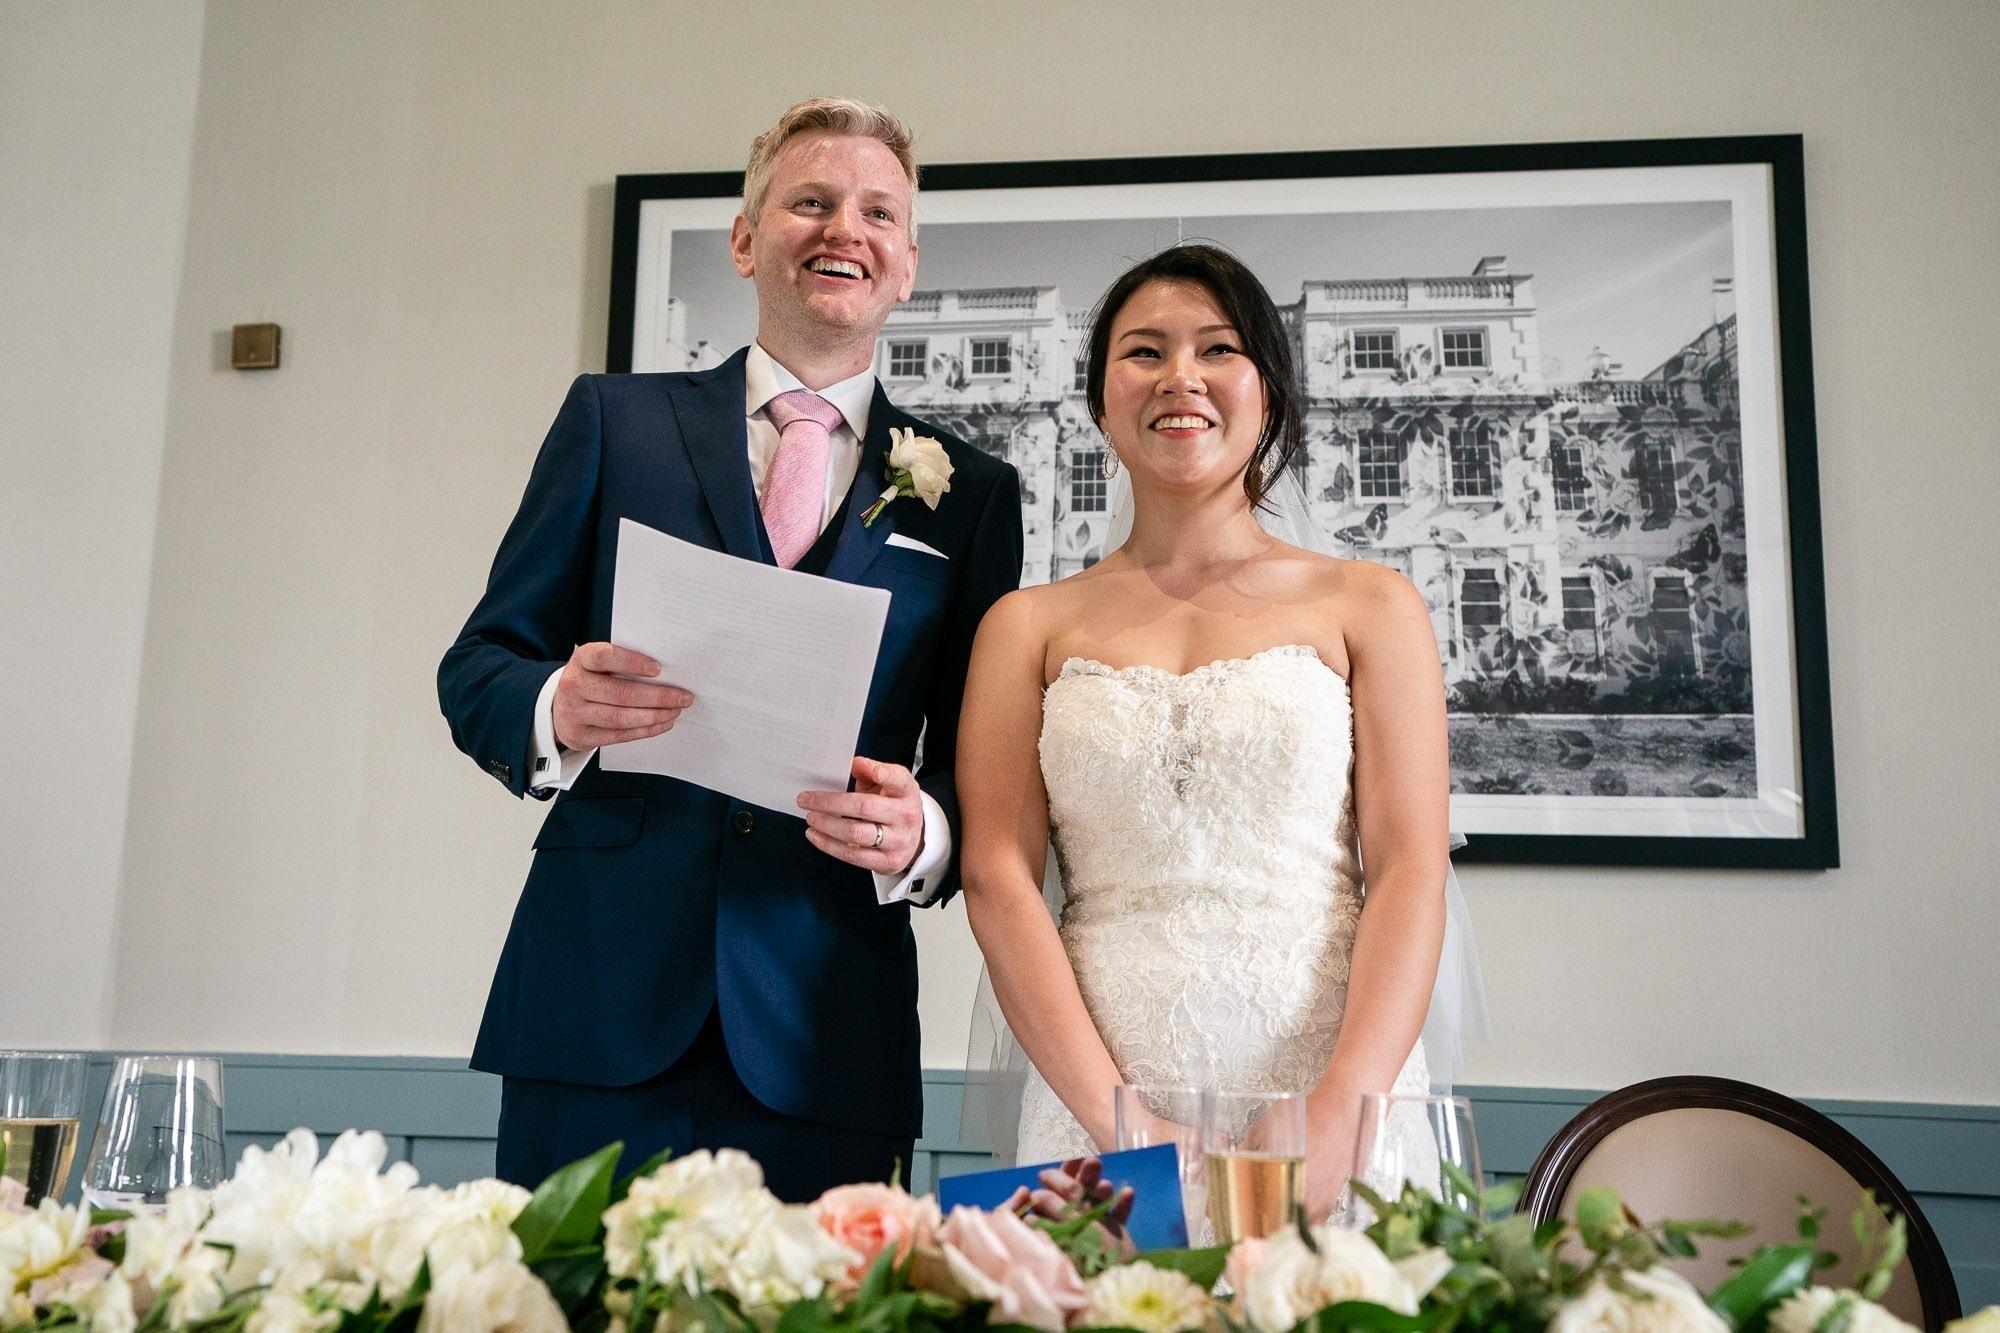 Wedding Speeches at De Vere Wokefiled Estate